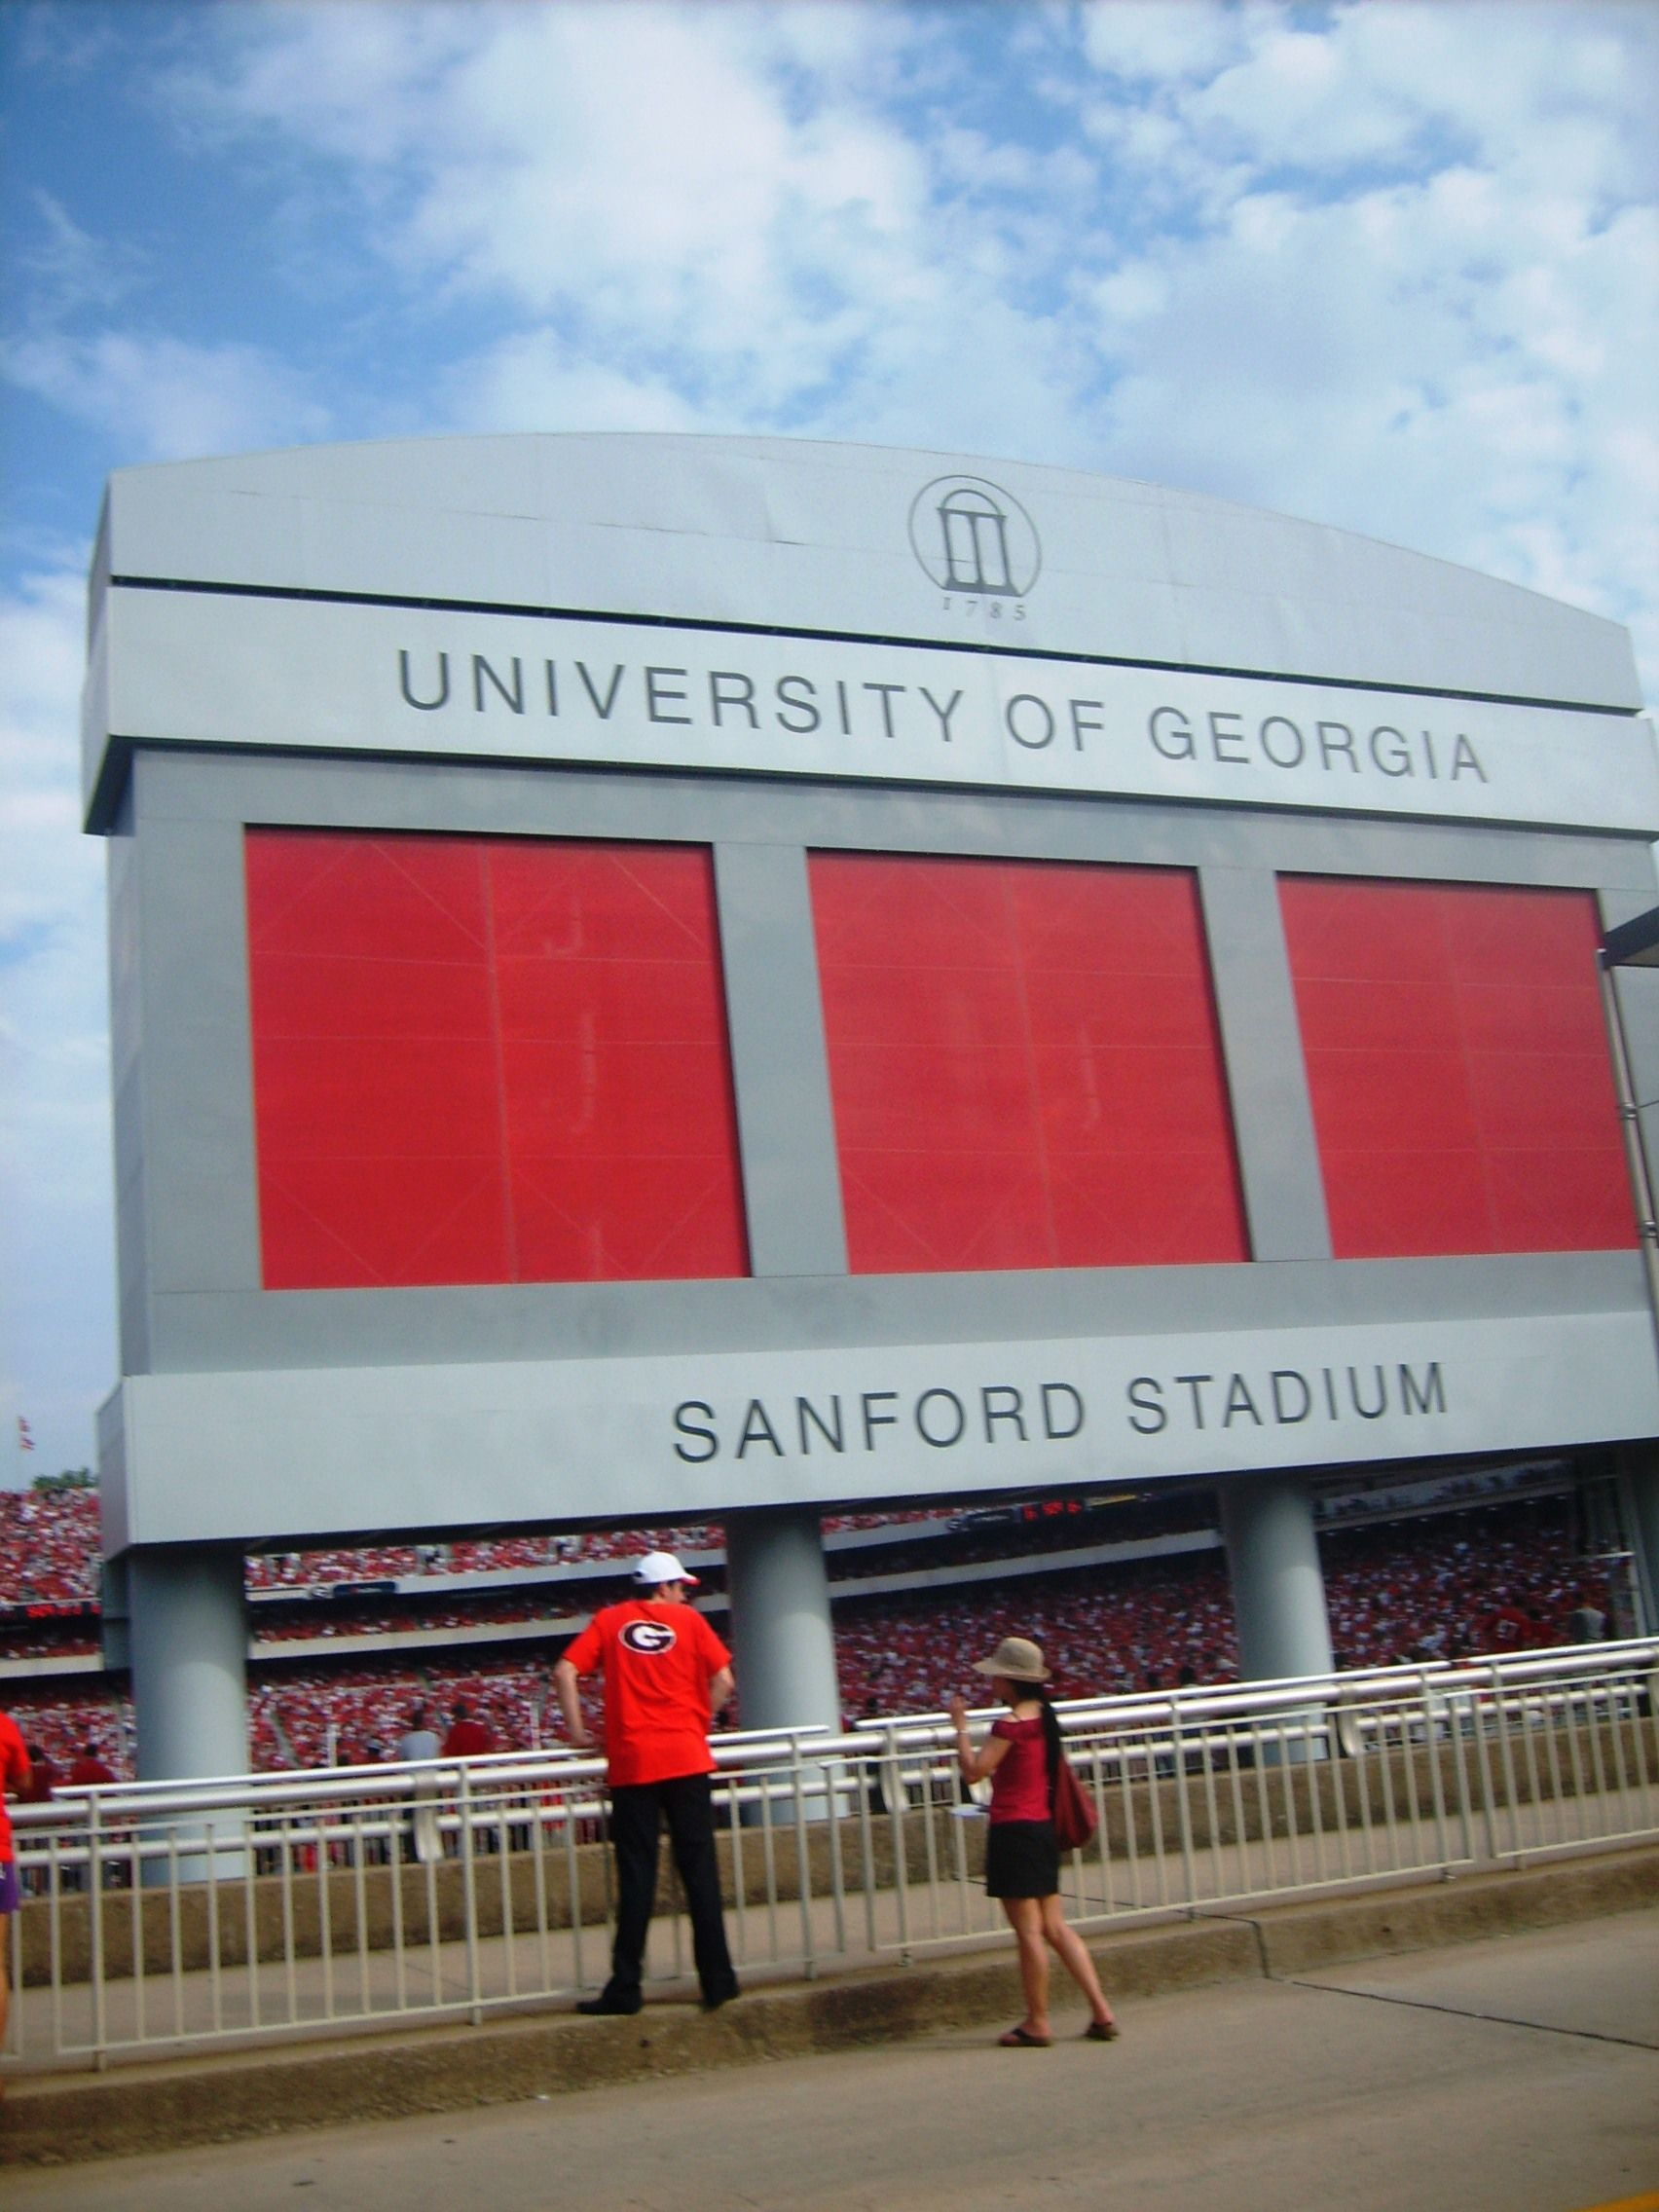 dbe0f374ee2 Sanford Stadium at The University of Georgia  UGA  Dawgs